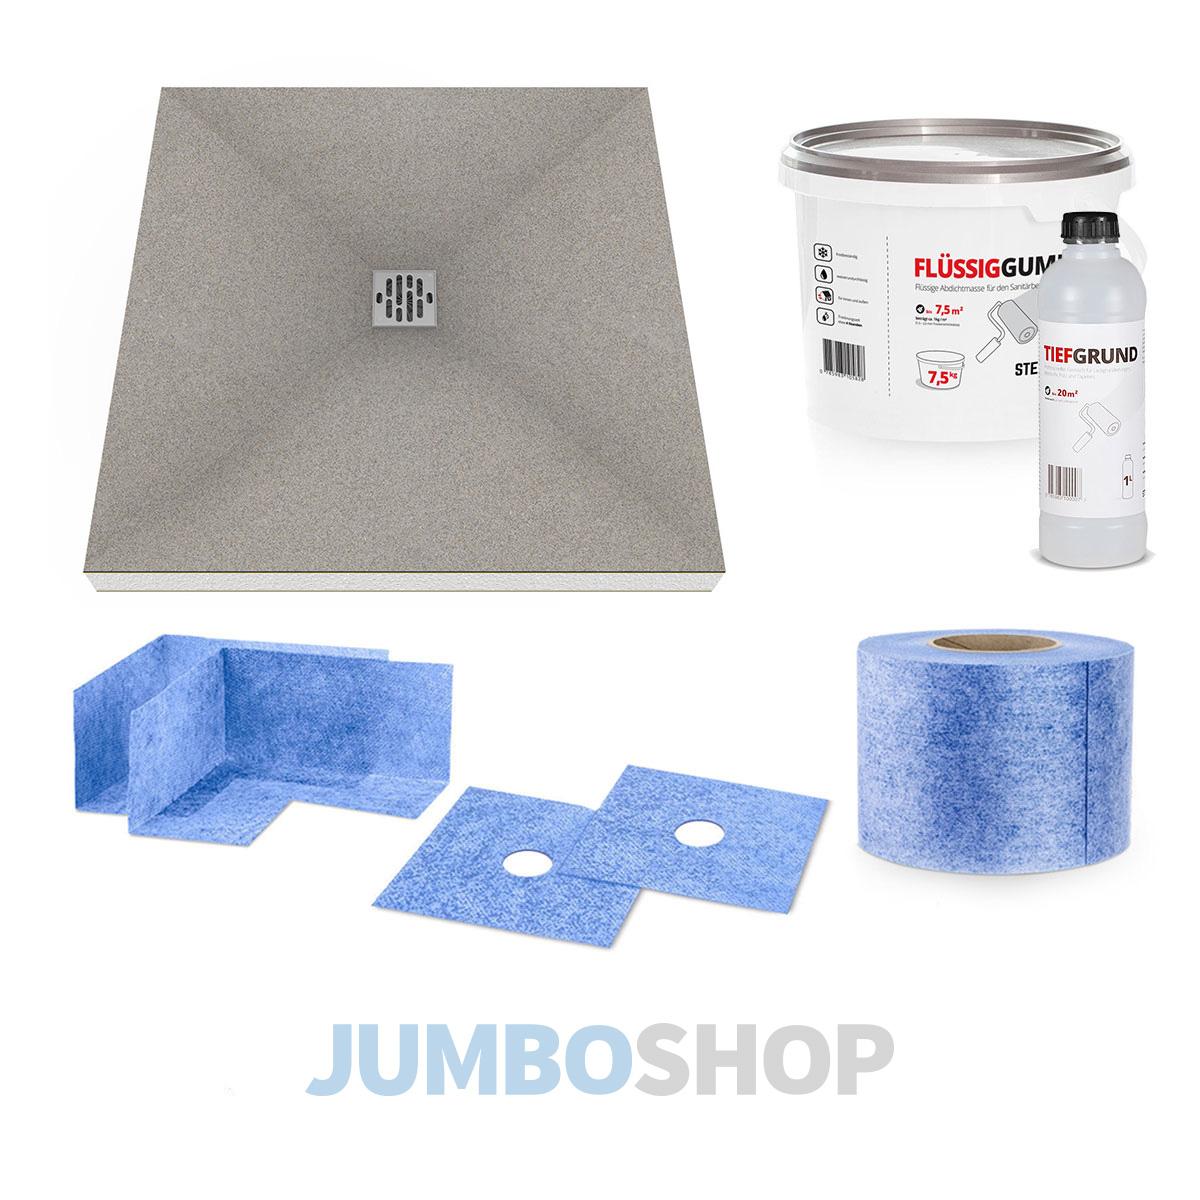 duschelement duschboard befliesbar bodeneben mit mineralischer beschichtung ebay. Black Bedroom Furniture Sets. Home Design Ideas